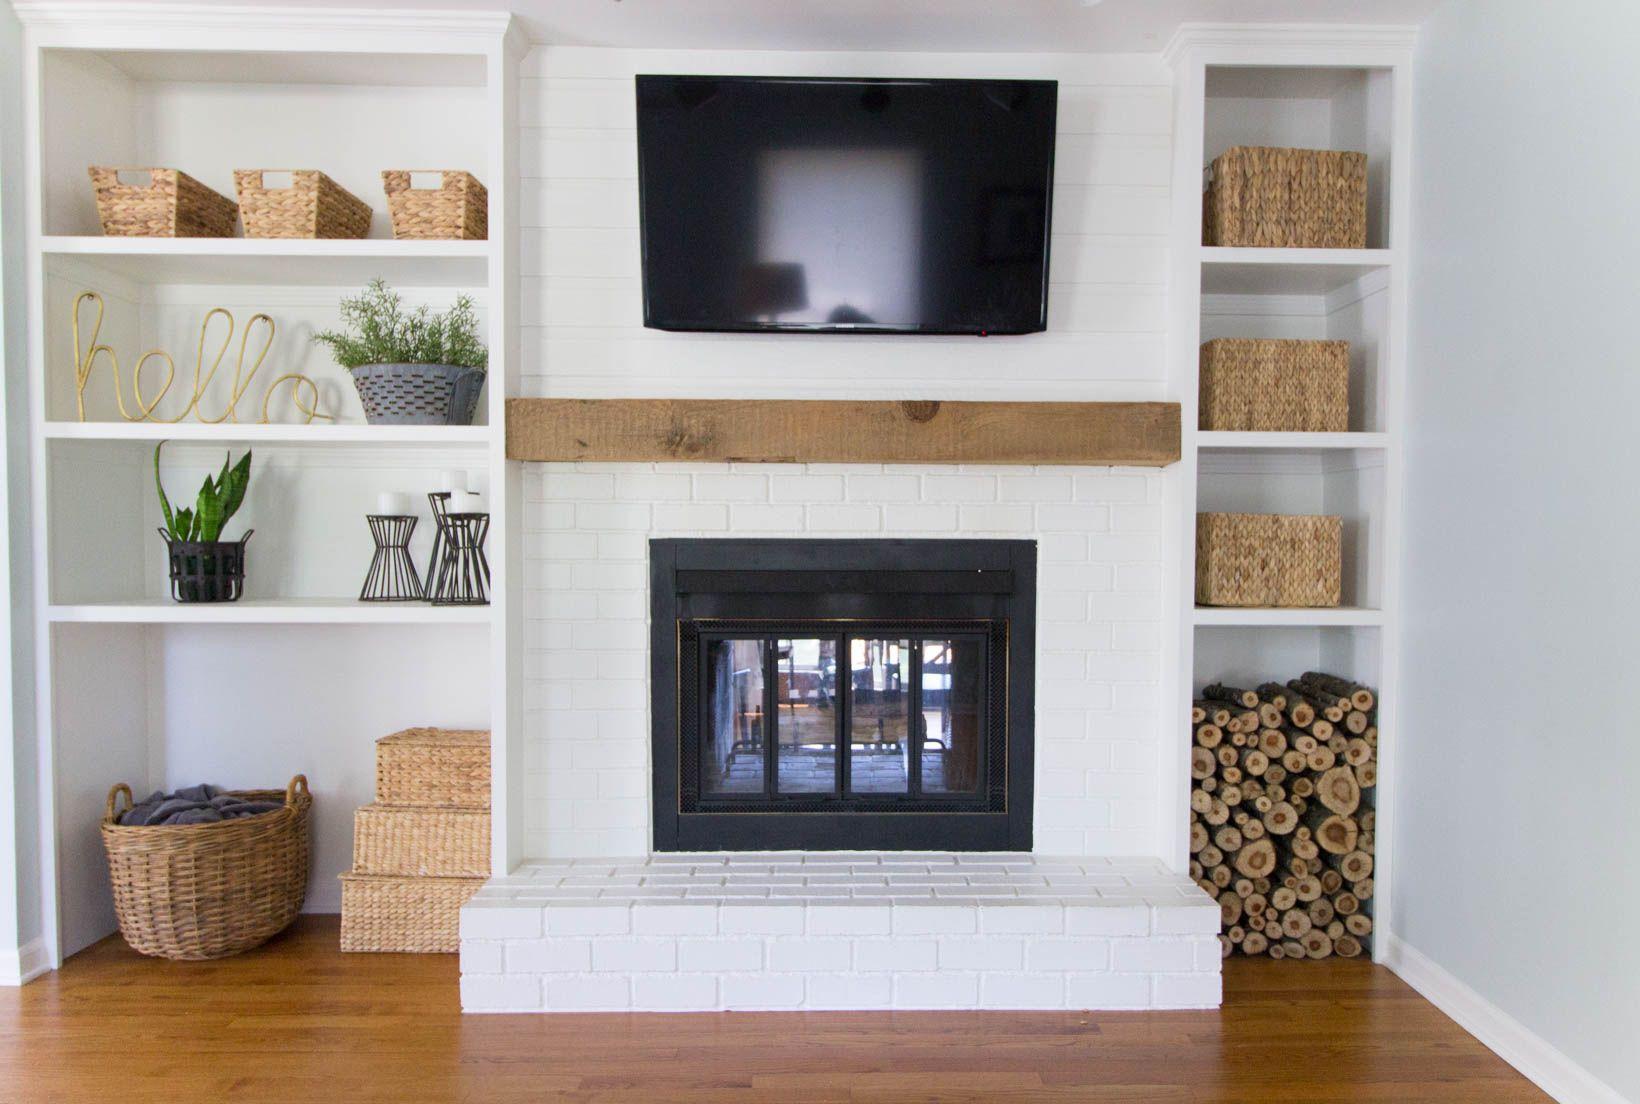 Built In Wall Fireplace Inspirational Built In Shelves Around Shallow Depth Brick Fireplace